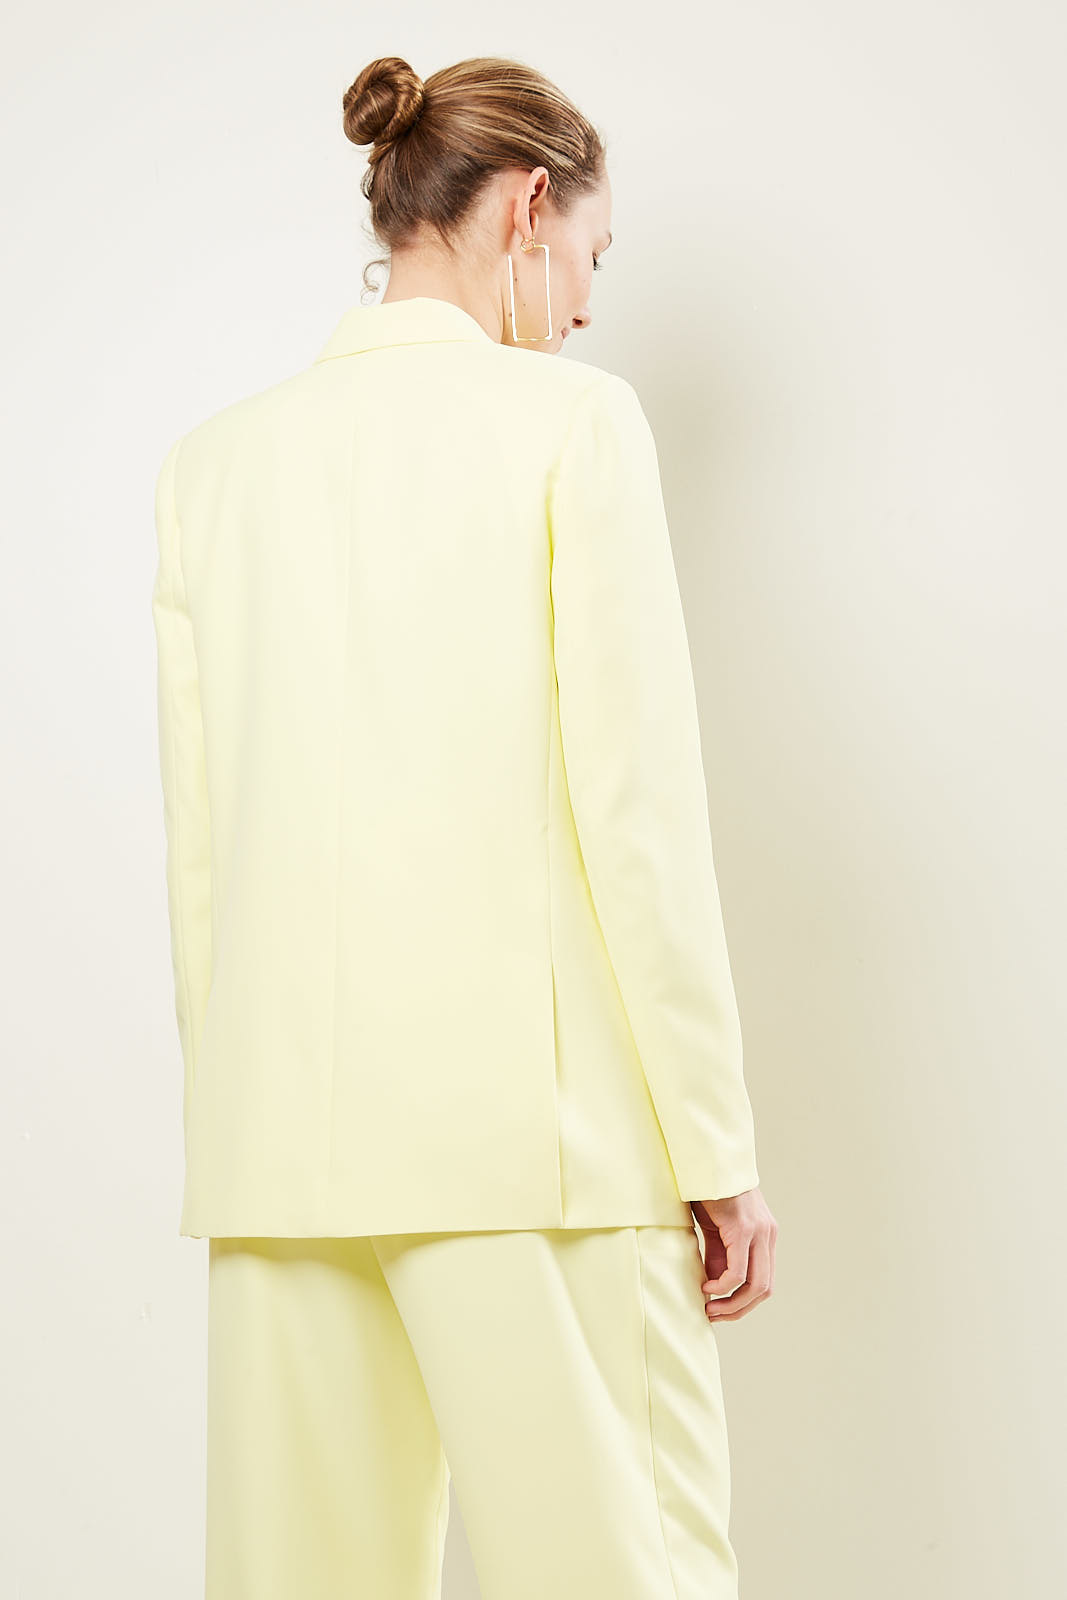 Simon Miller - Galen jacket